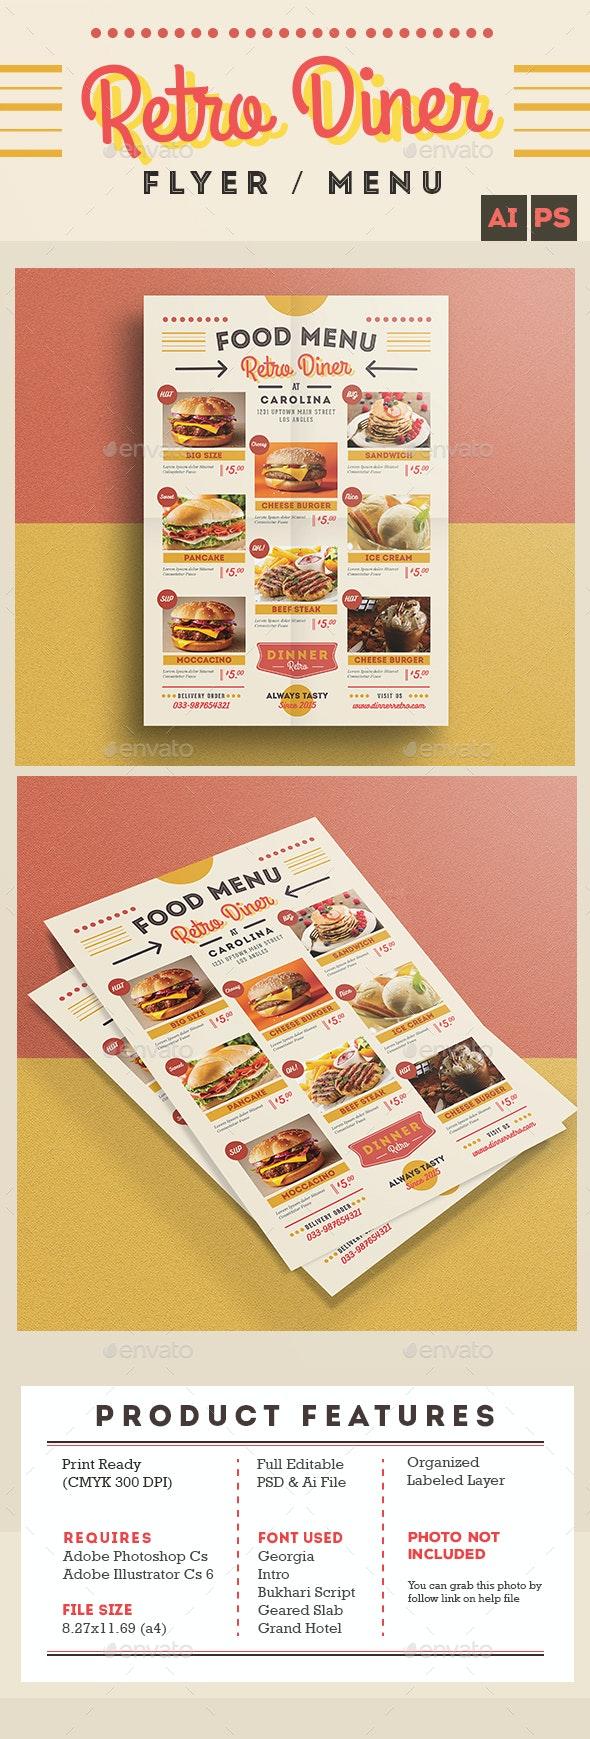 Retro Diner Flyer/Menu - Restaurant Flyers